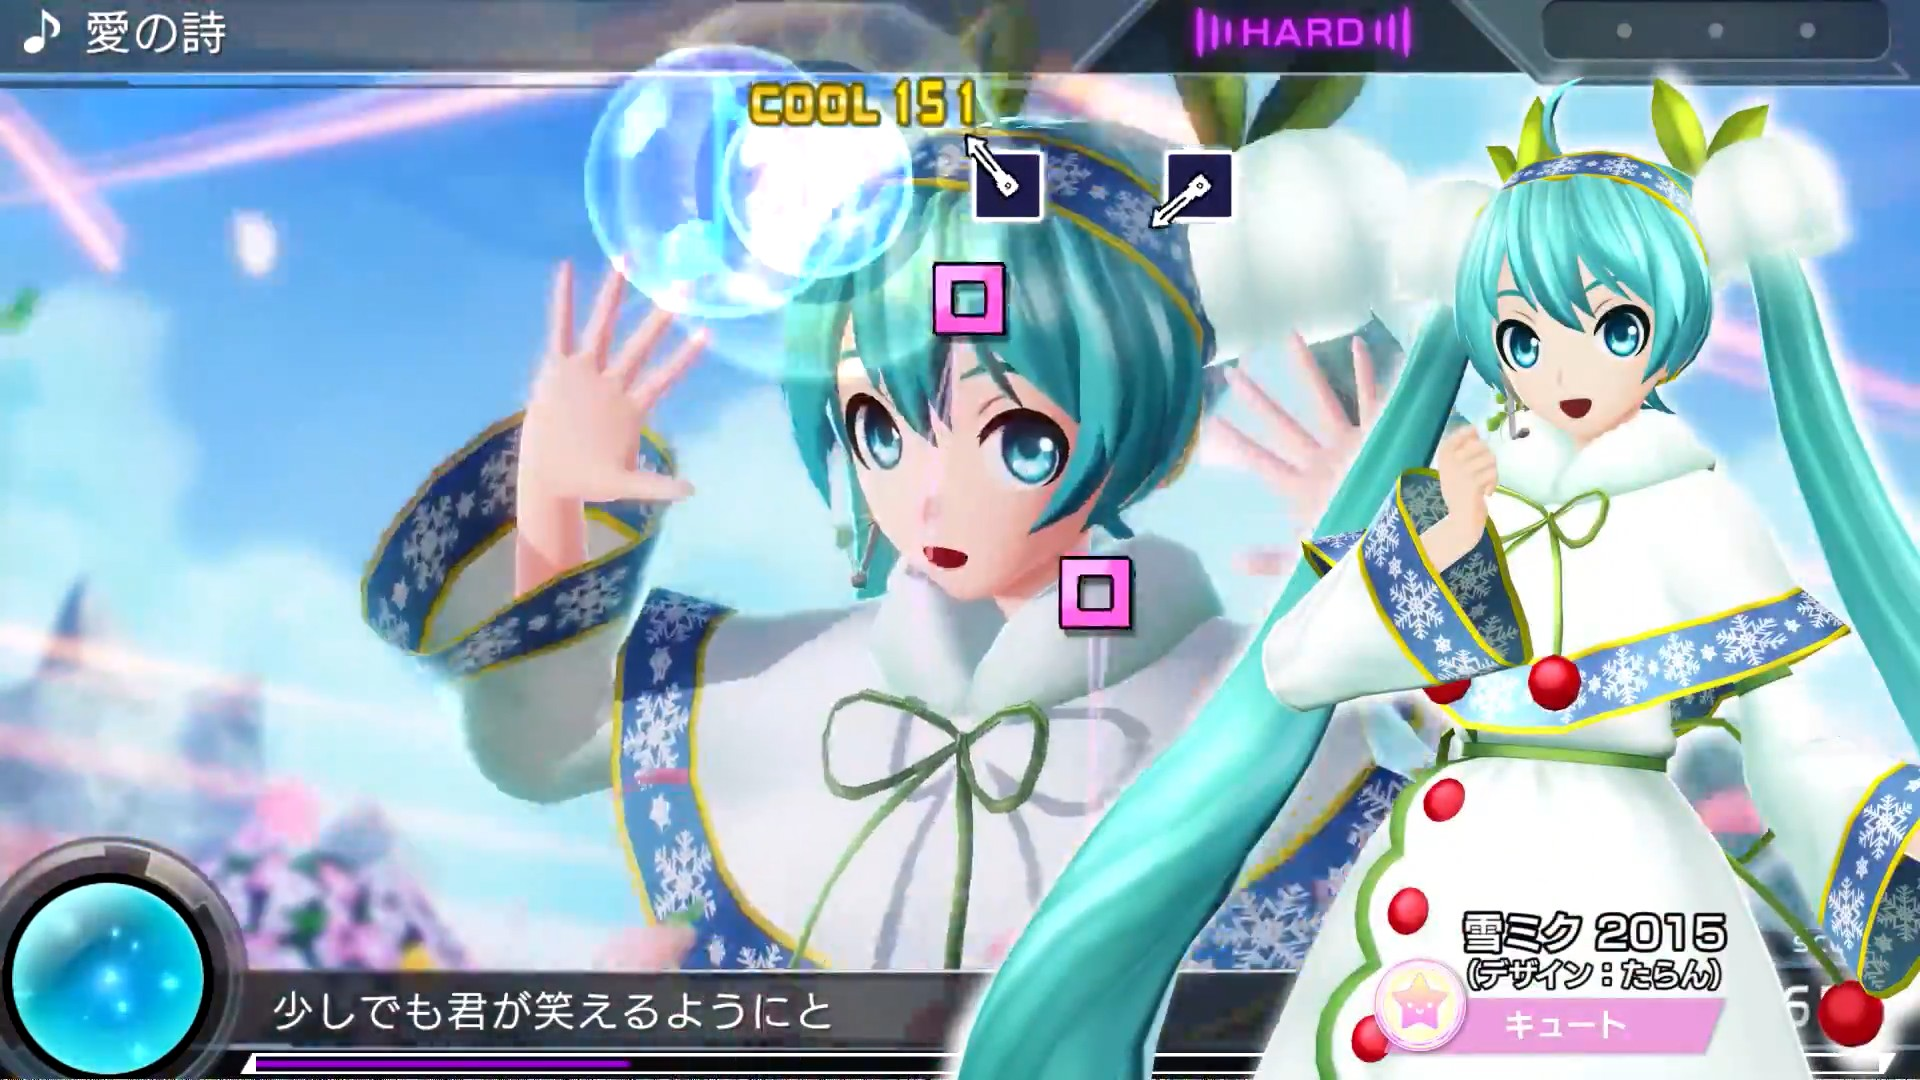 Hatsune miku project diva x snow miku dlc costumes for japan segalization - Hatsune miku project diva x ...